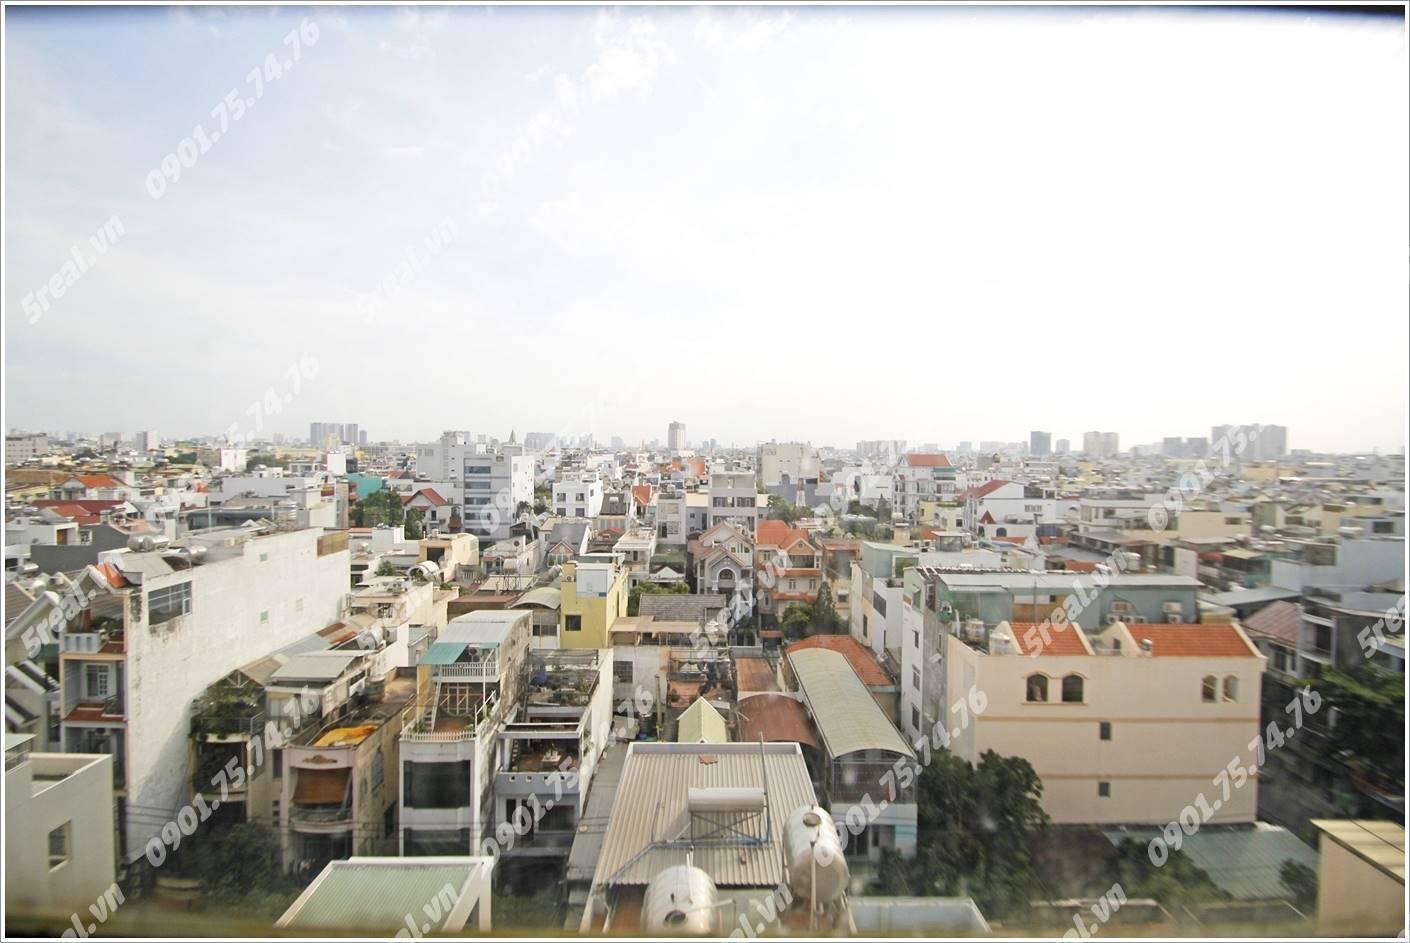 halo-le-trung-nghia-building-quan-tan-binh-van-phong-cho-thue-5real.vn-012